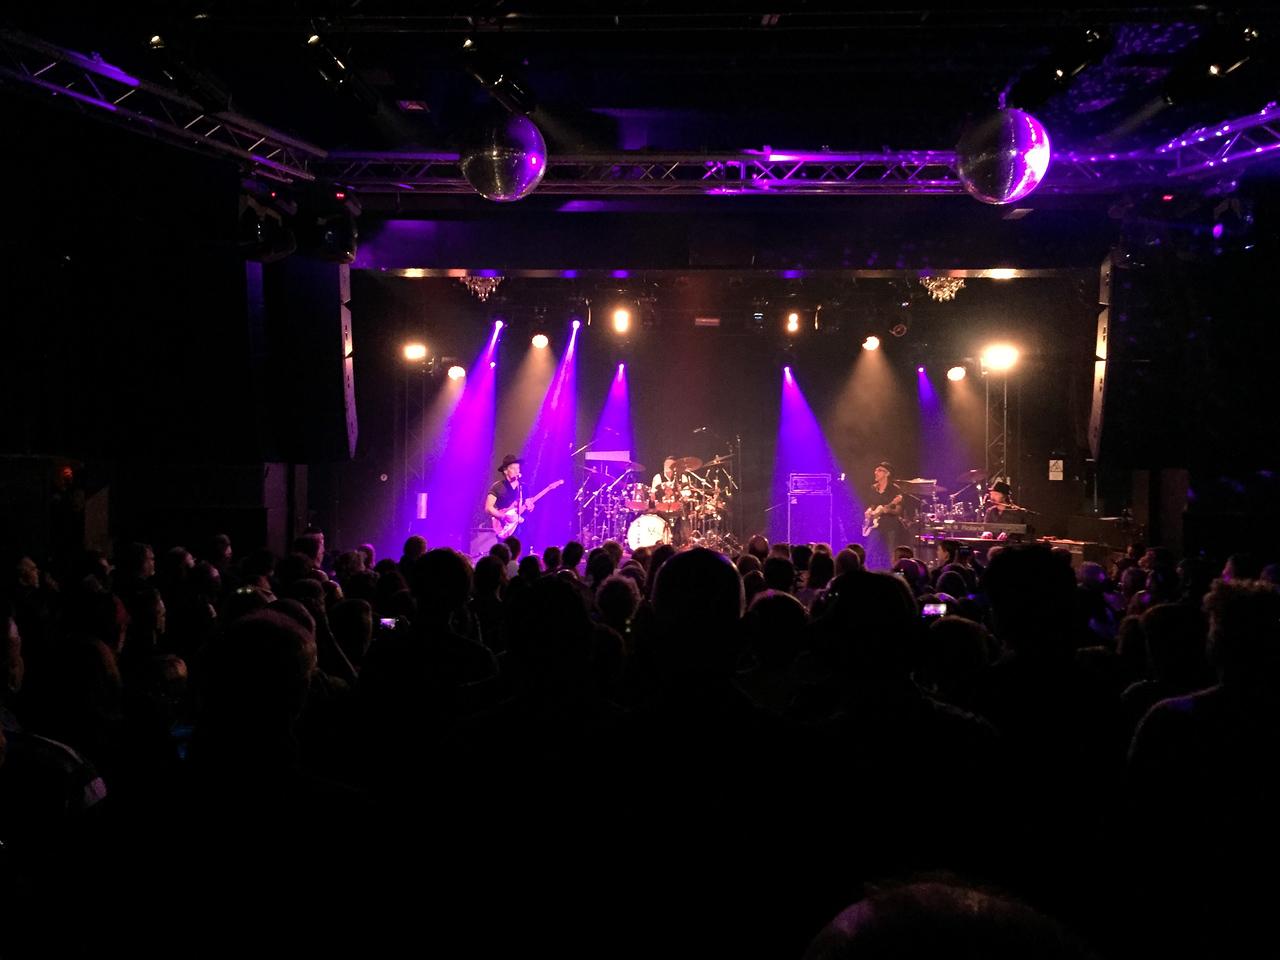 Mick Fleetwood Blues Band